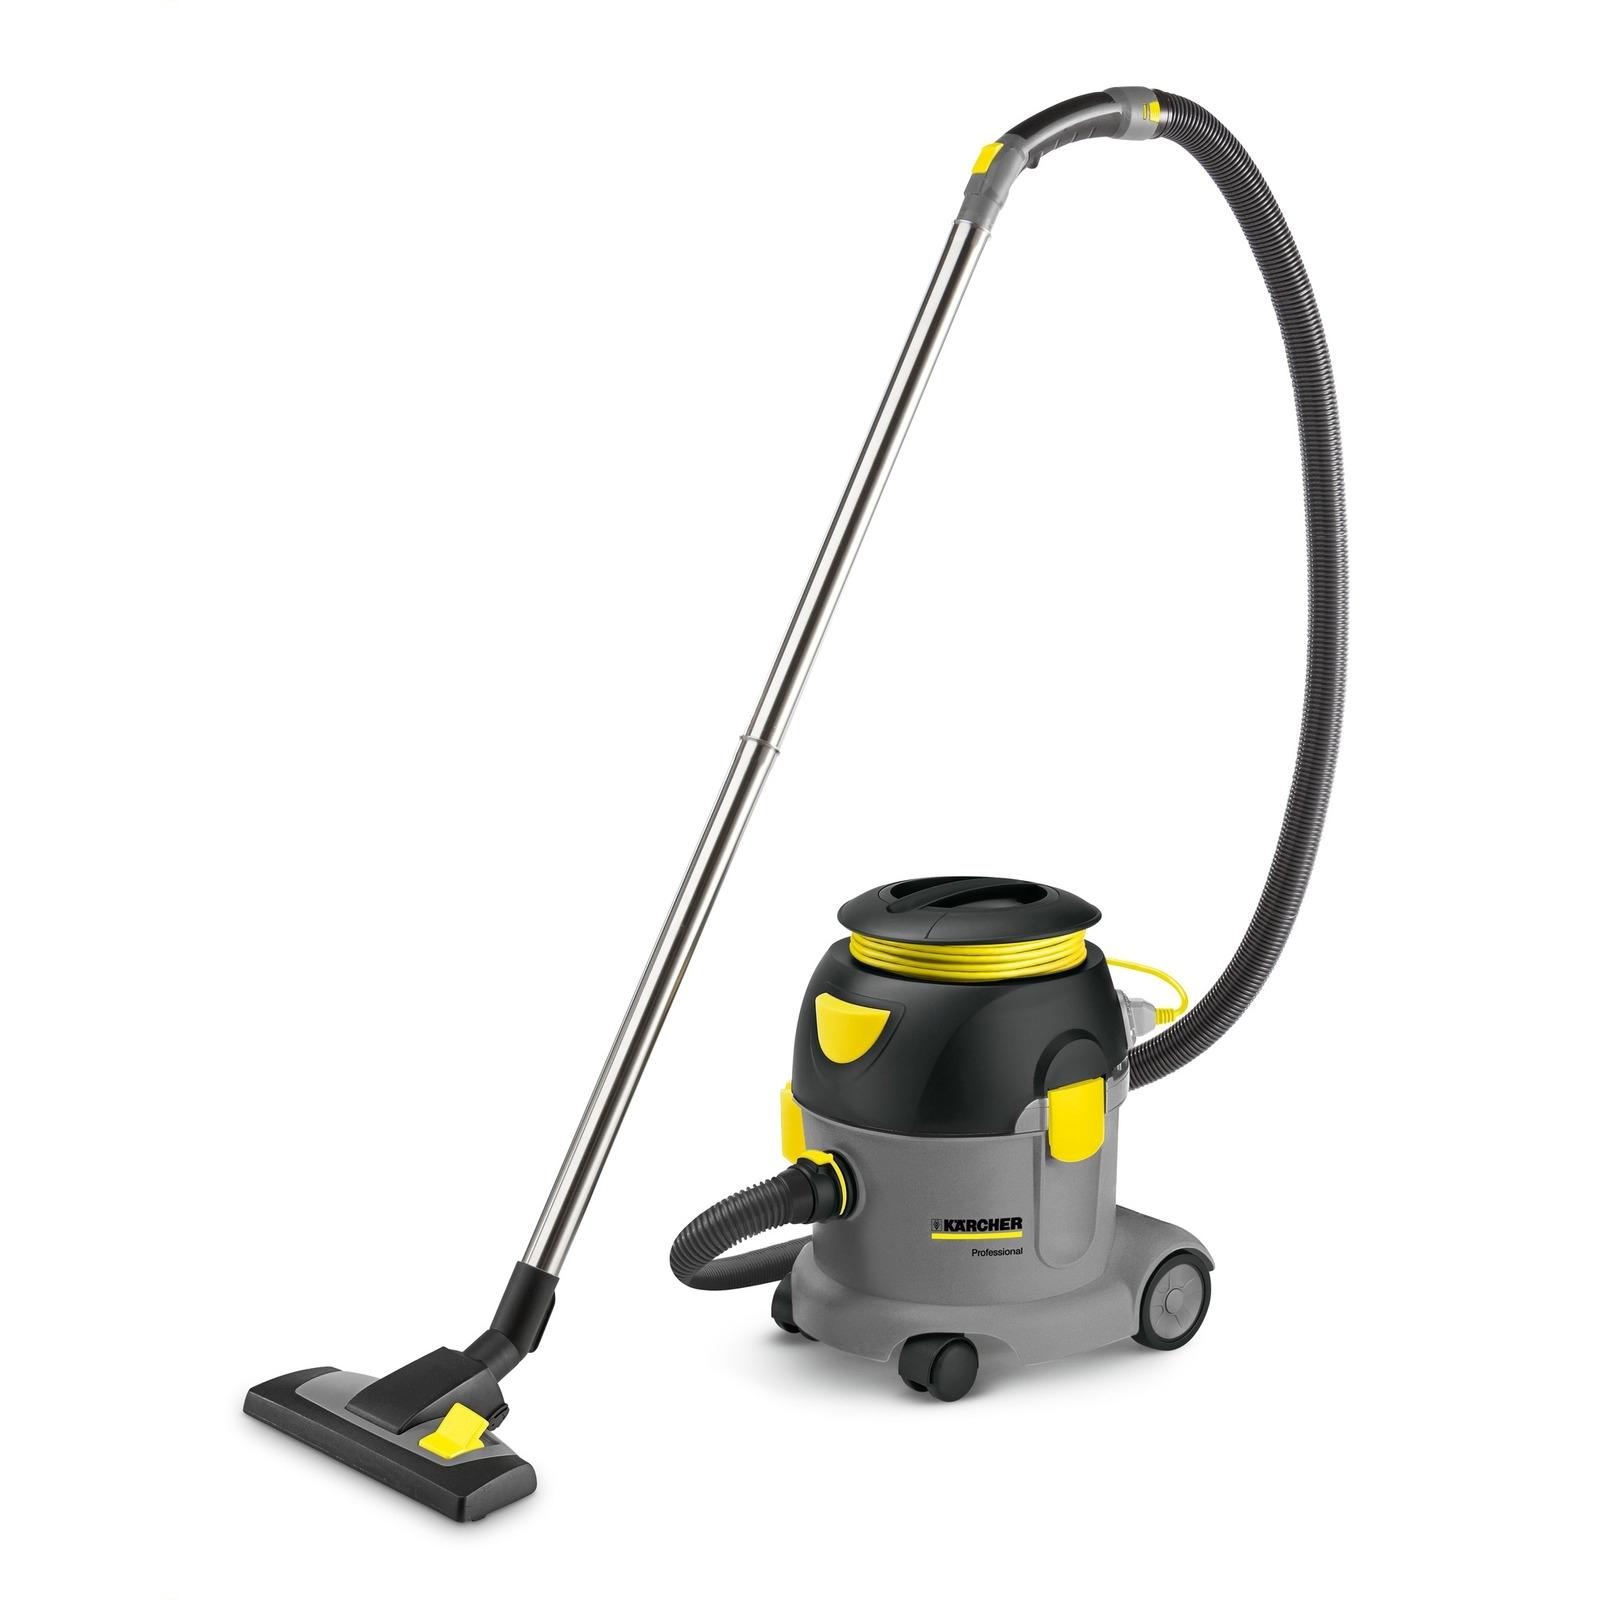 Karcher T10/1 Adv Dry Vacuum Cleaner